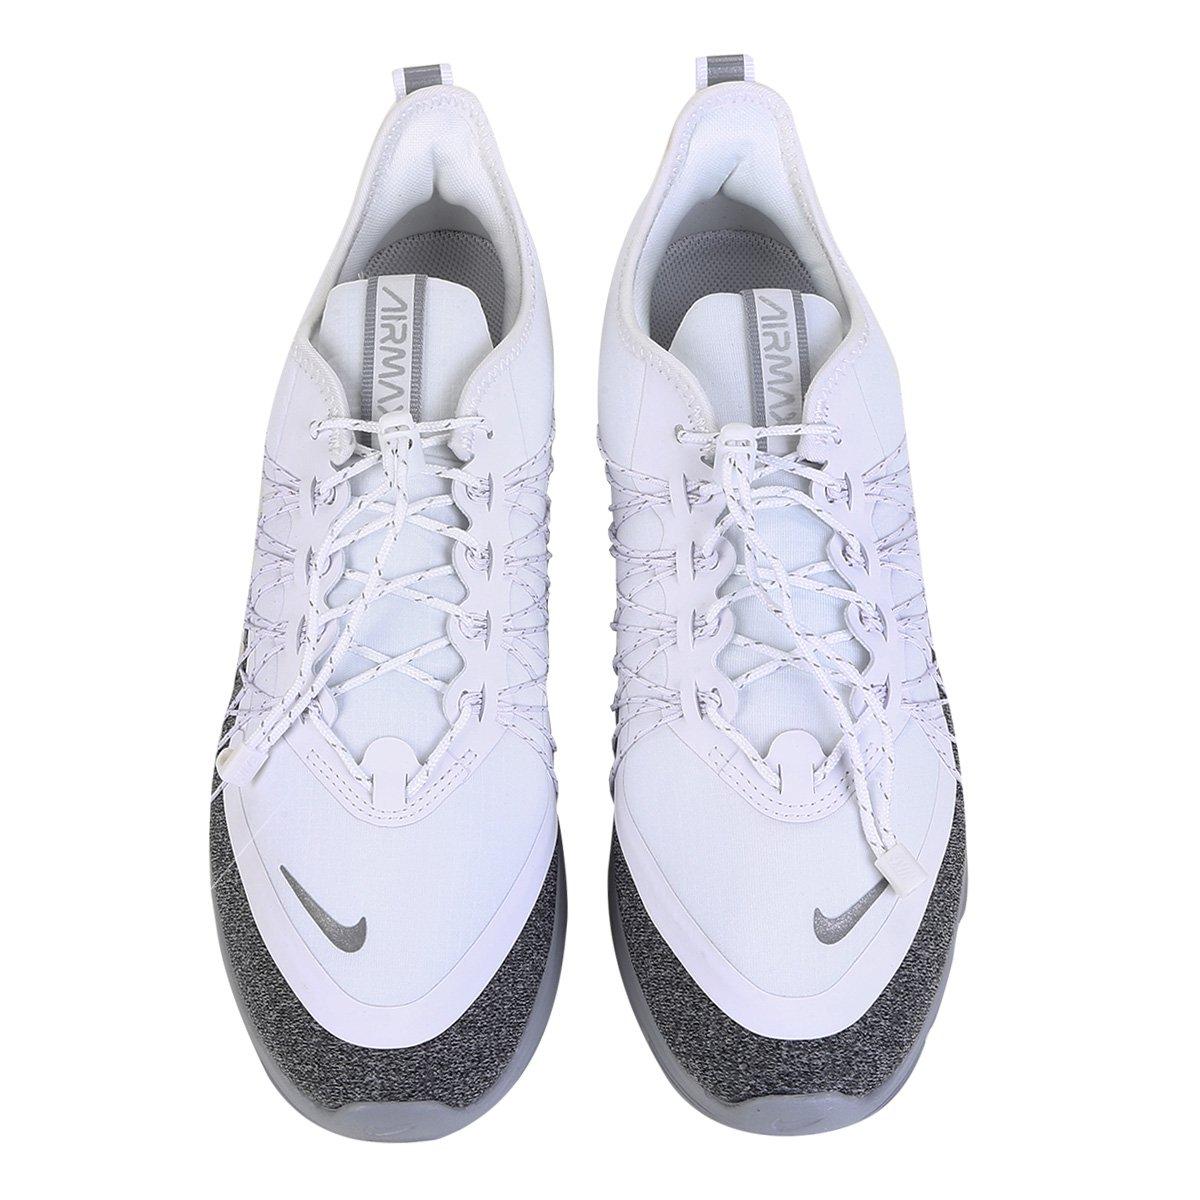 Tênis Nike Air Max Sequent 4 Utility Feminino - Tam: 34 - 1